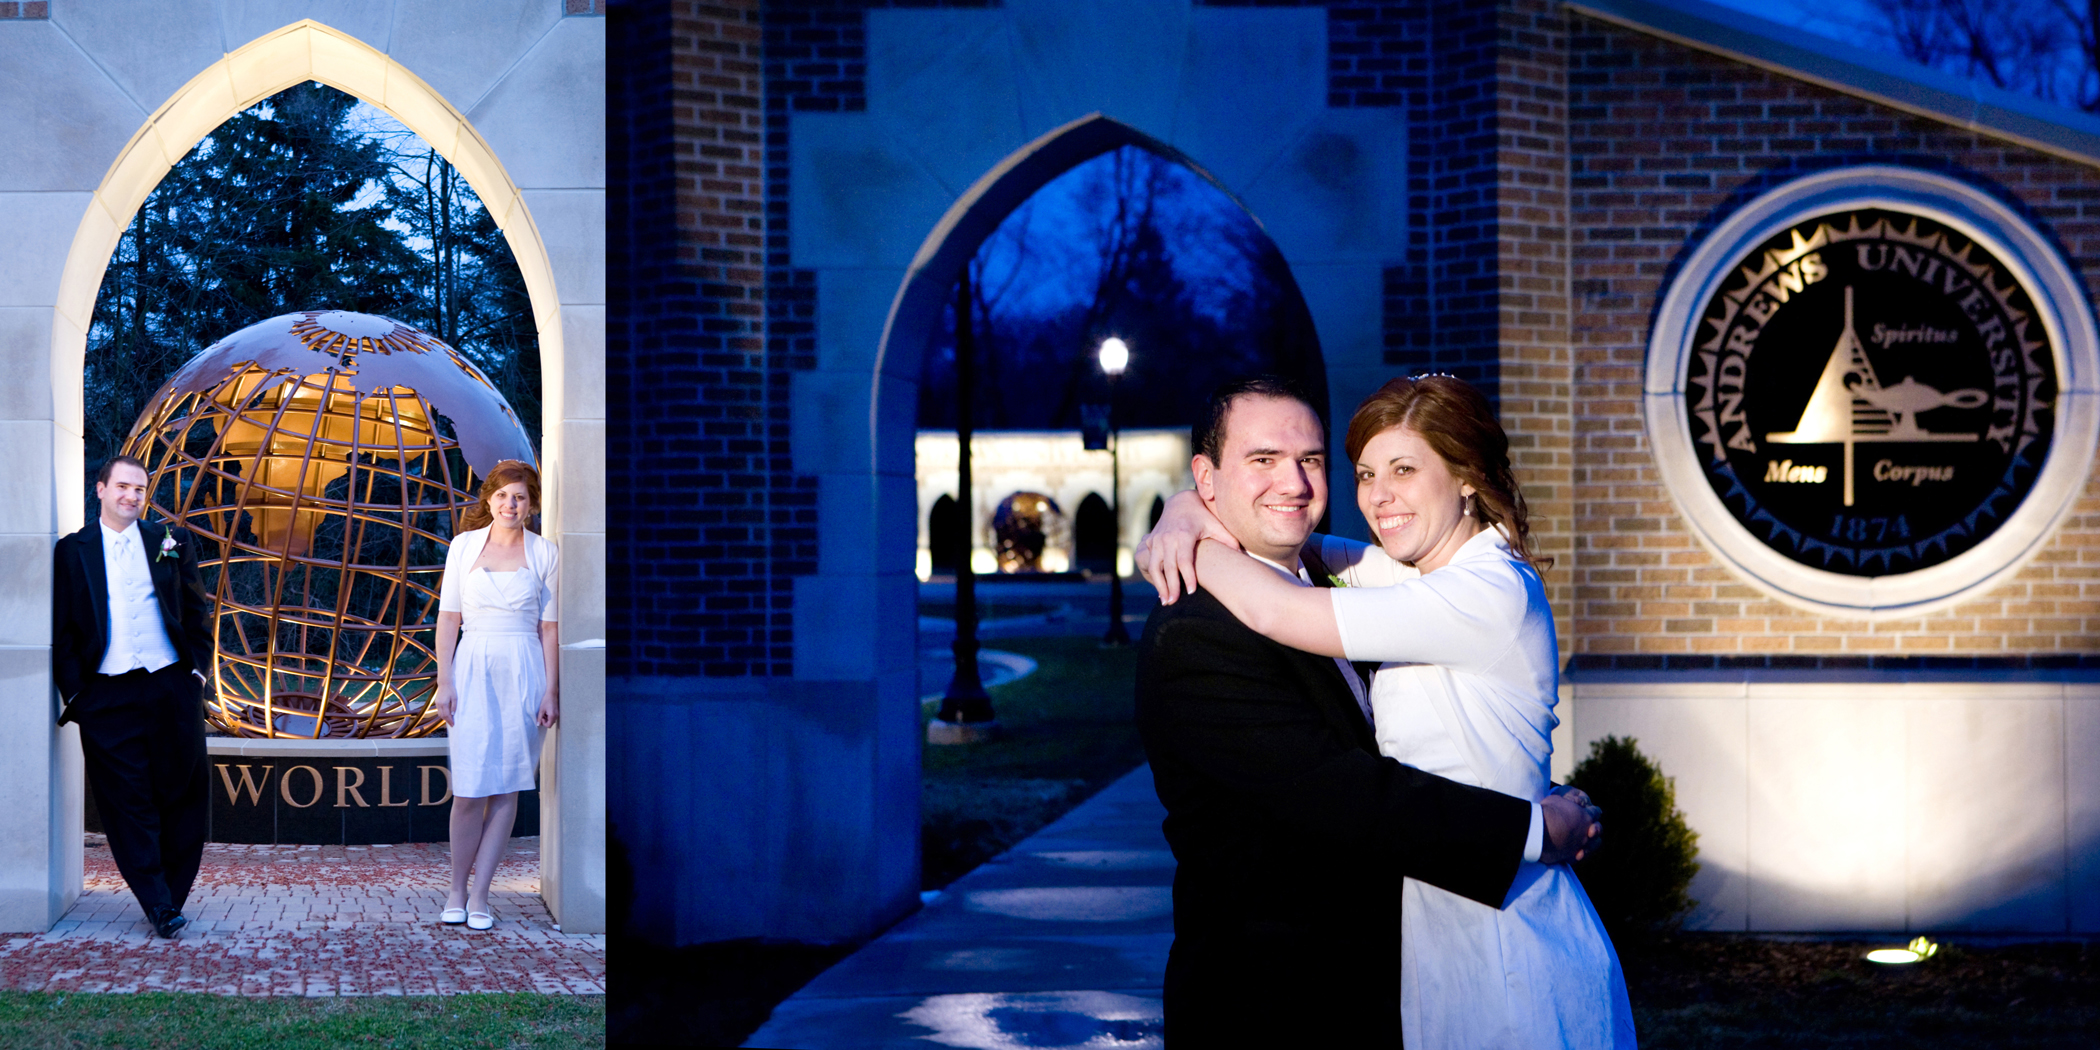 wedding-photography-Andrews-University-Berrien-Springs-Michigan_12.jpg